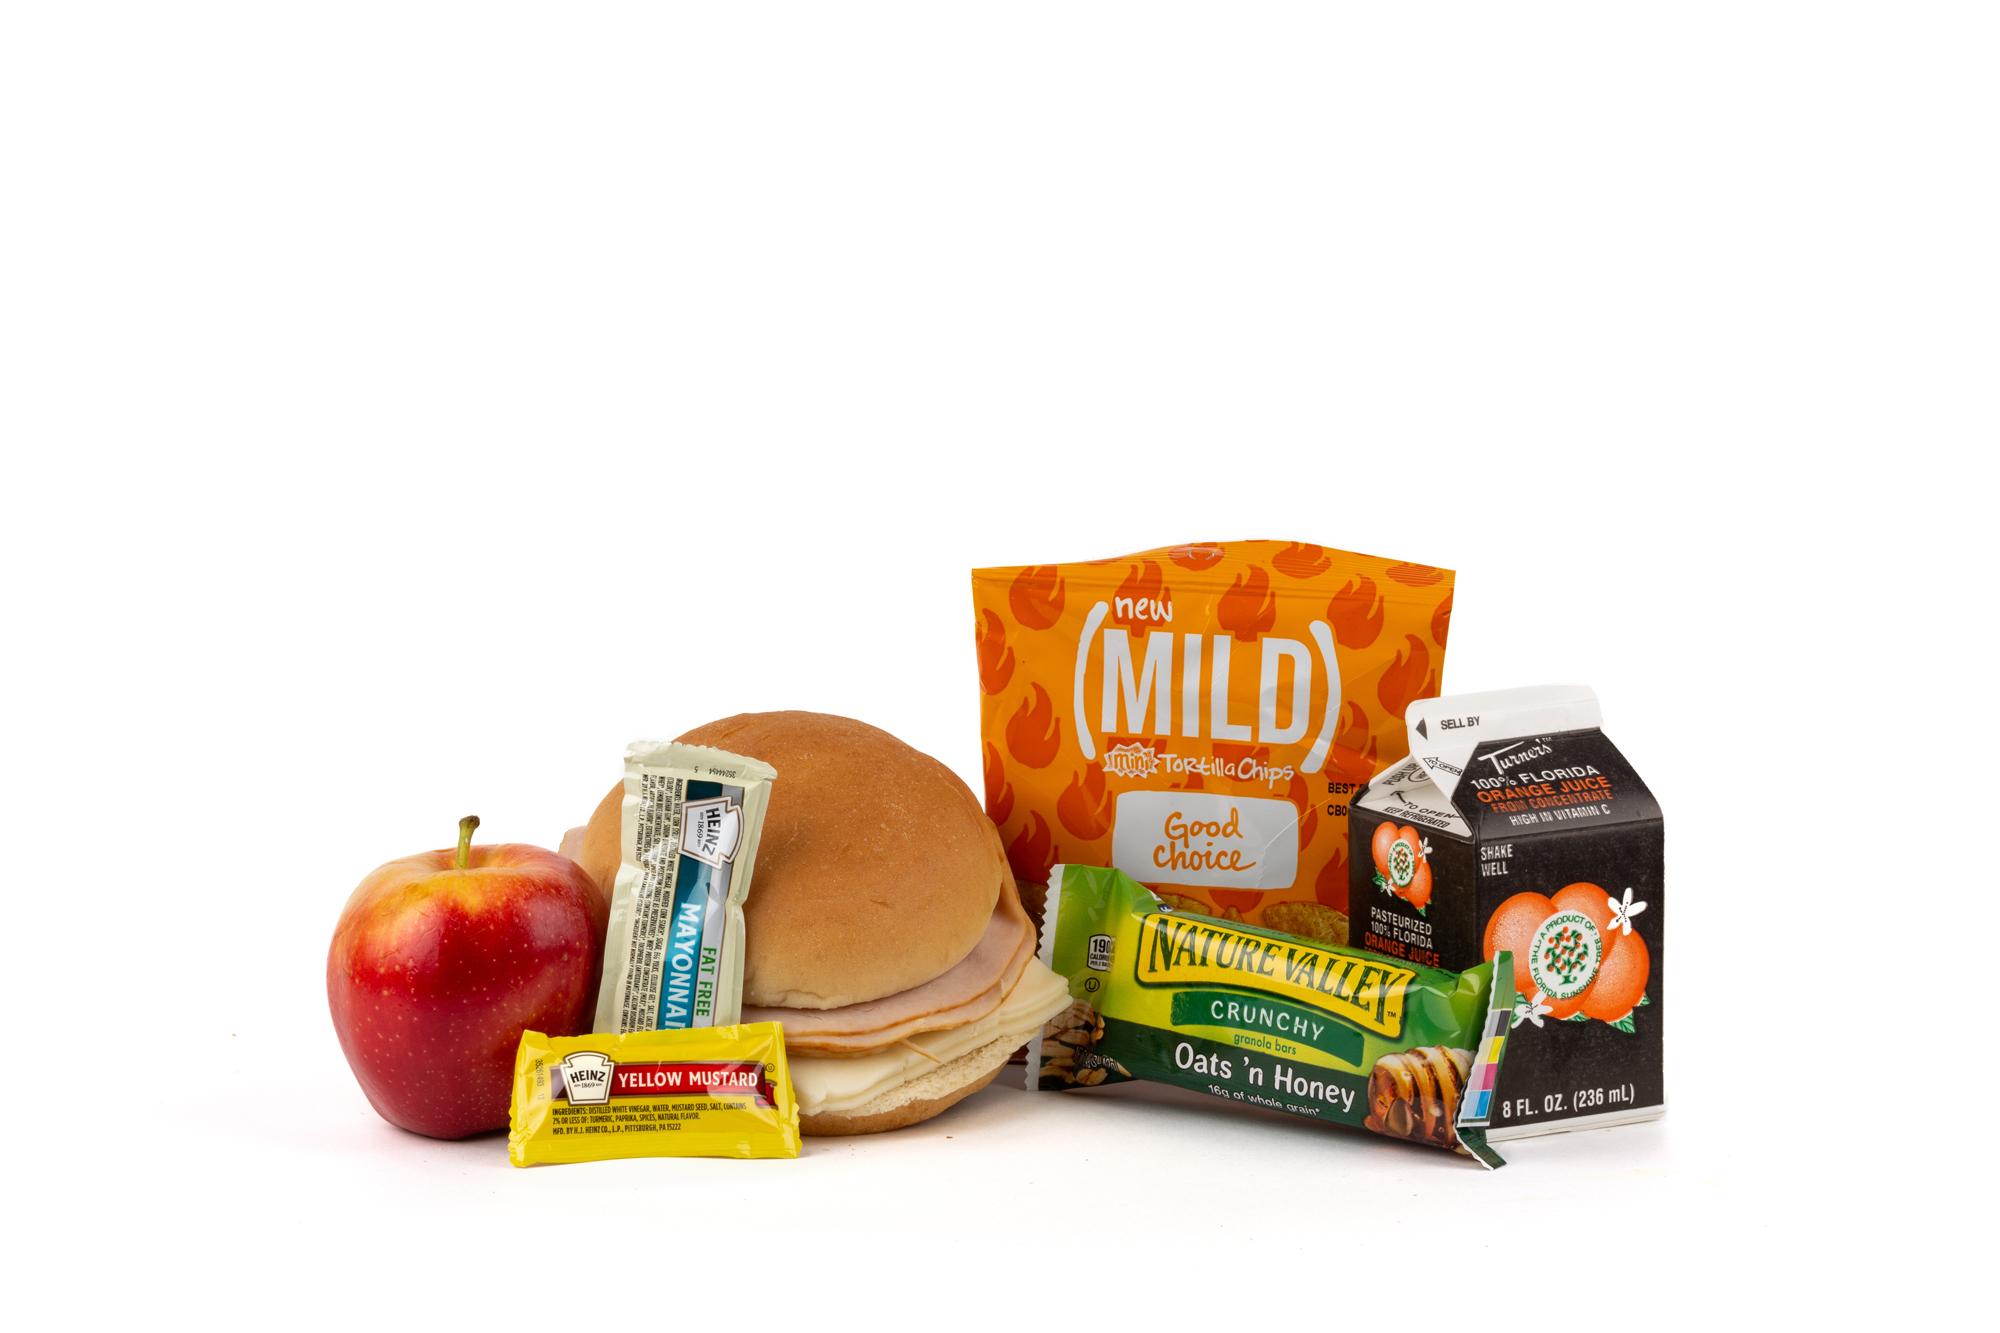 MK08 - Fresh Turkey / Swiss  Sliced Turkey Breast /Swiss On Wheat Bun Chip Tortilla Taco Bell Mild Apple Fuji 100 Mustard Packet Mayonnaise Packet Fatfree Dressing Granola Bar Oats and Honey Orange Juice